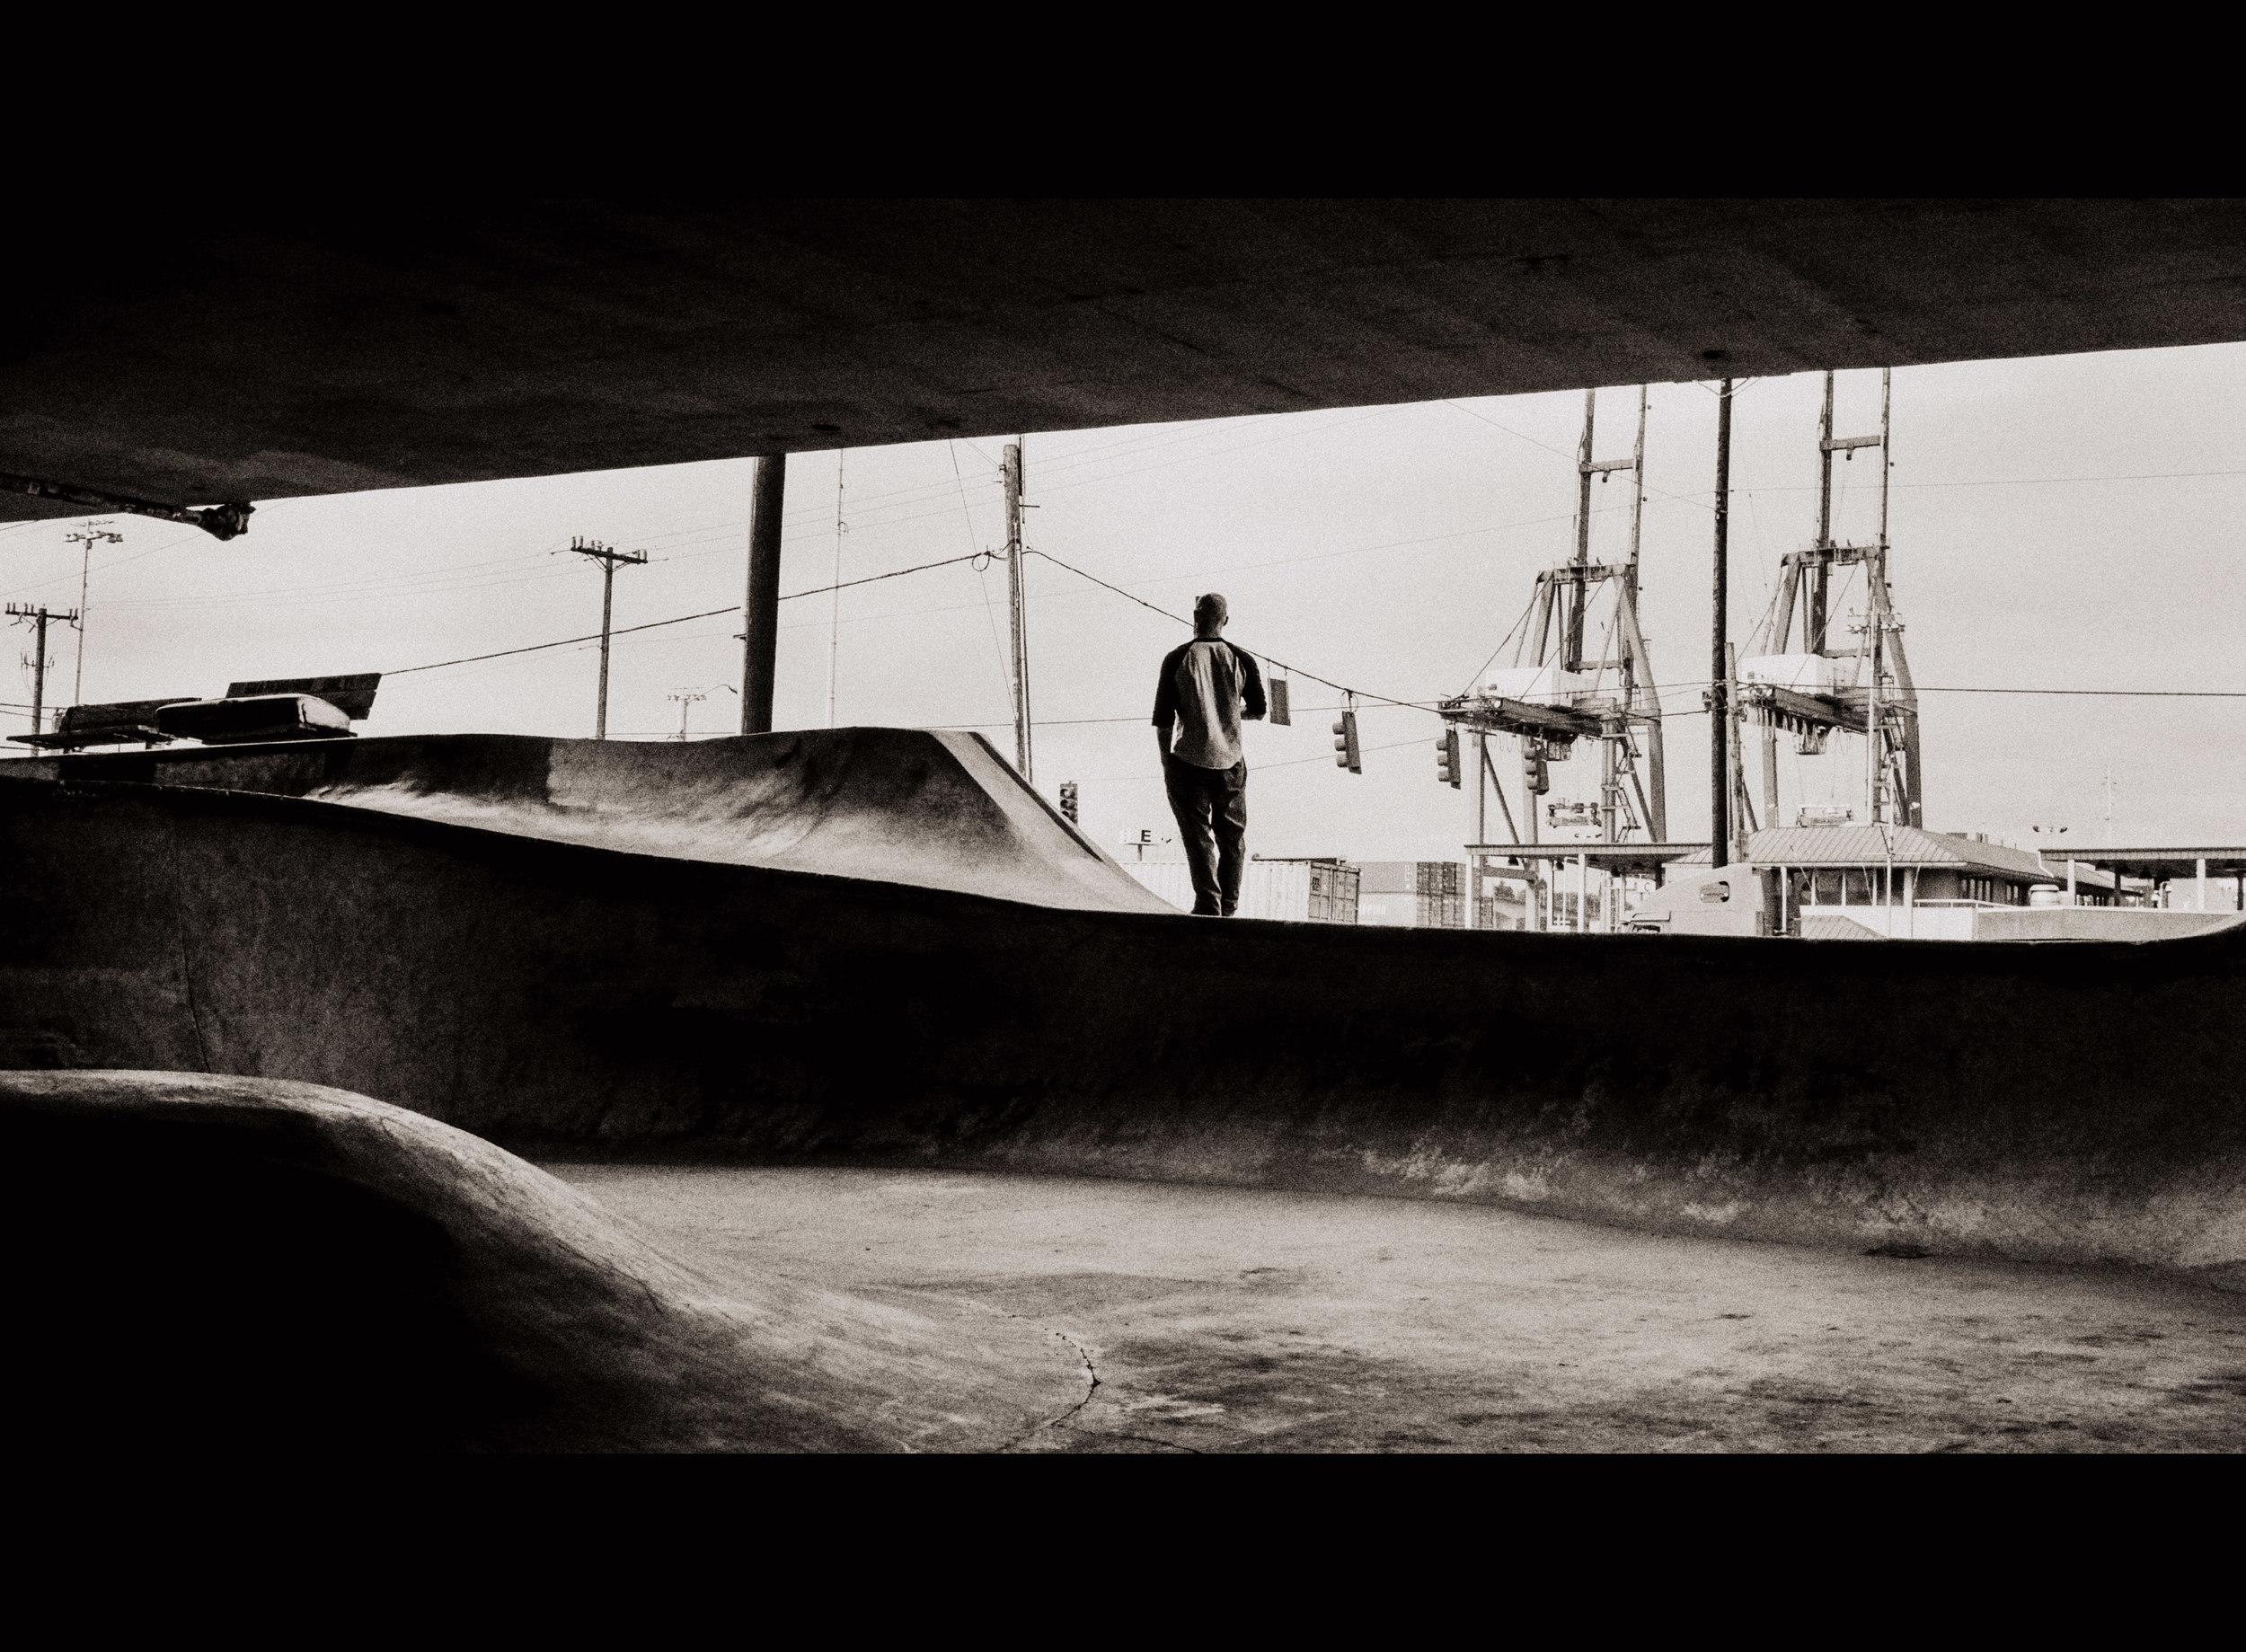 Union-of-Makers-Skate-Seattle-03.JPG